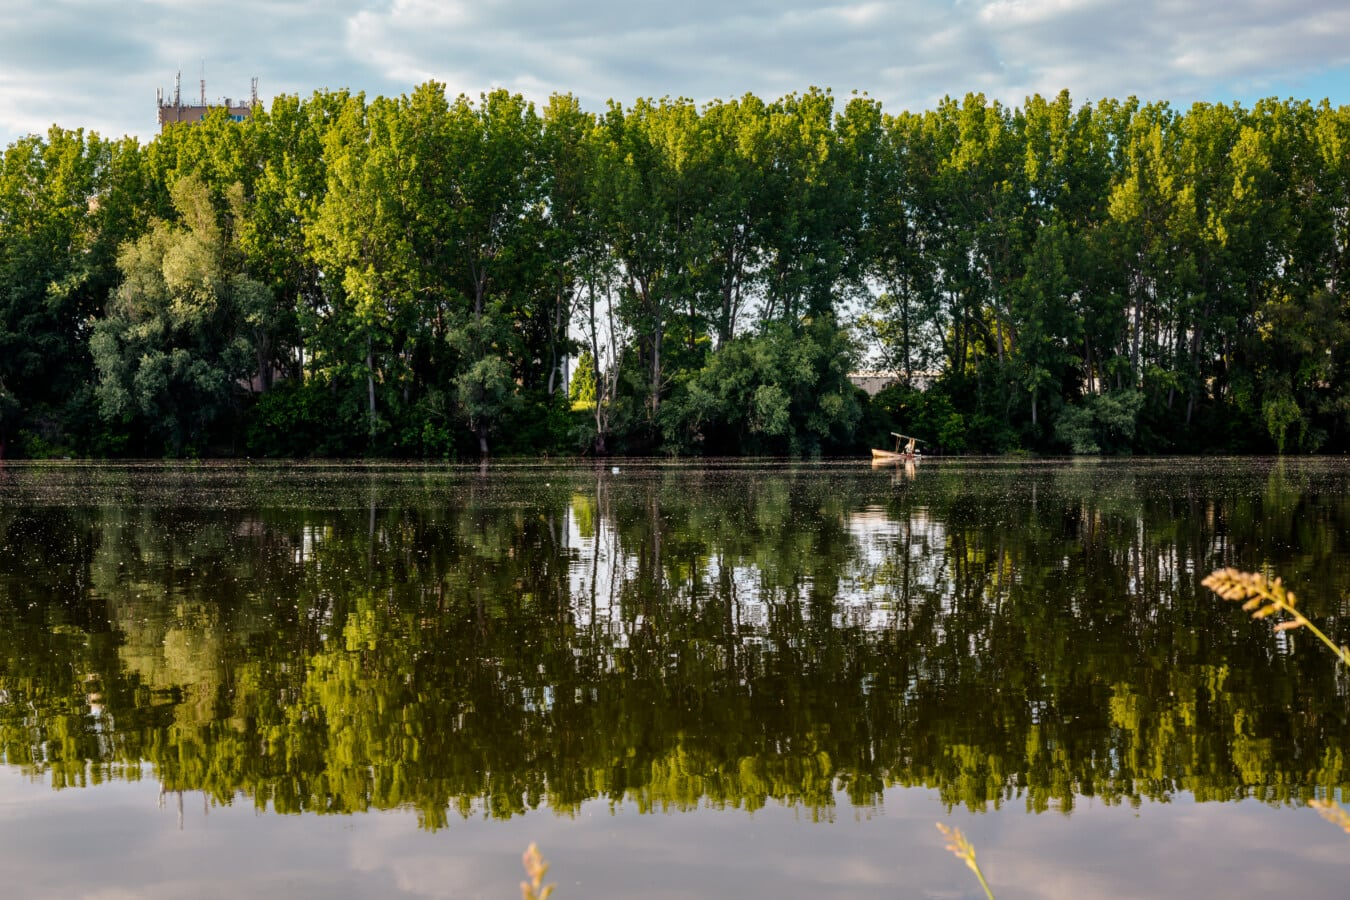 jezero, jezero pejzaž, obale, odraz, krajolik, voda, šuma, vrba, priroda, drvo